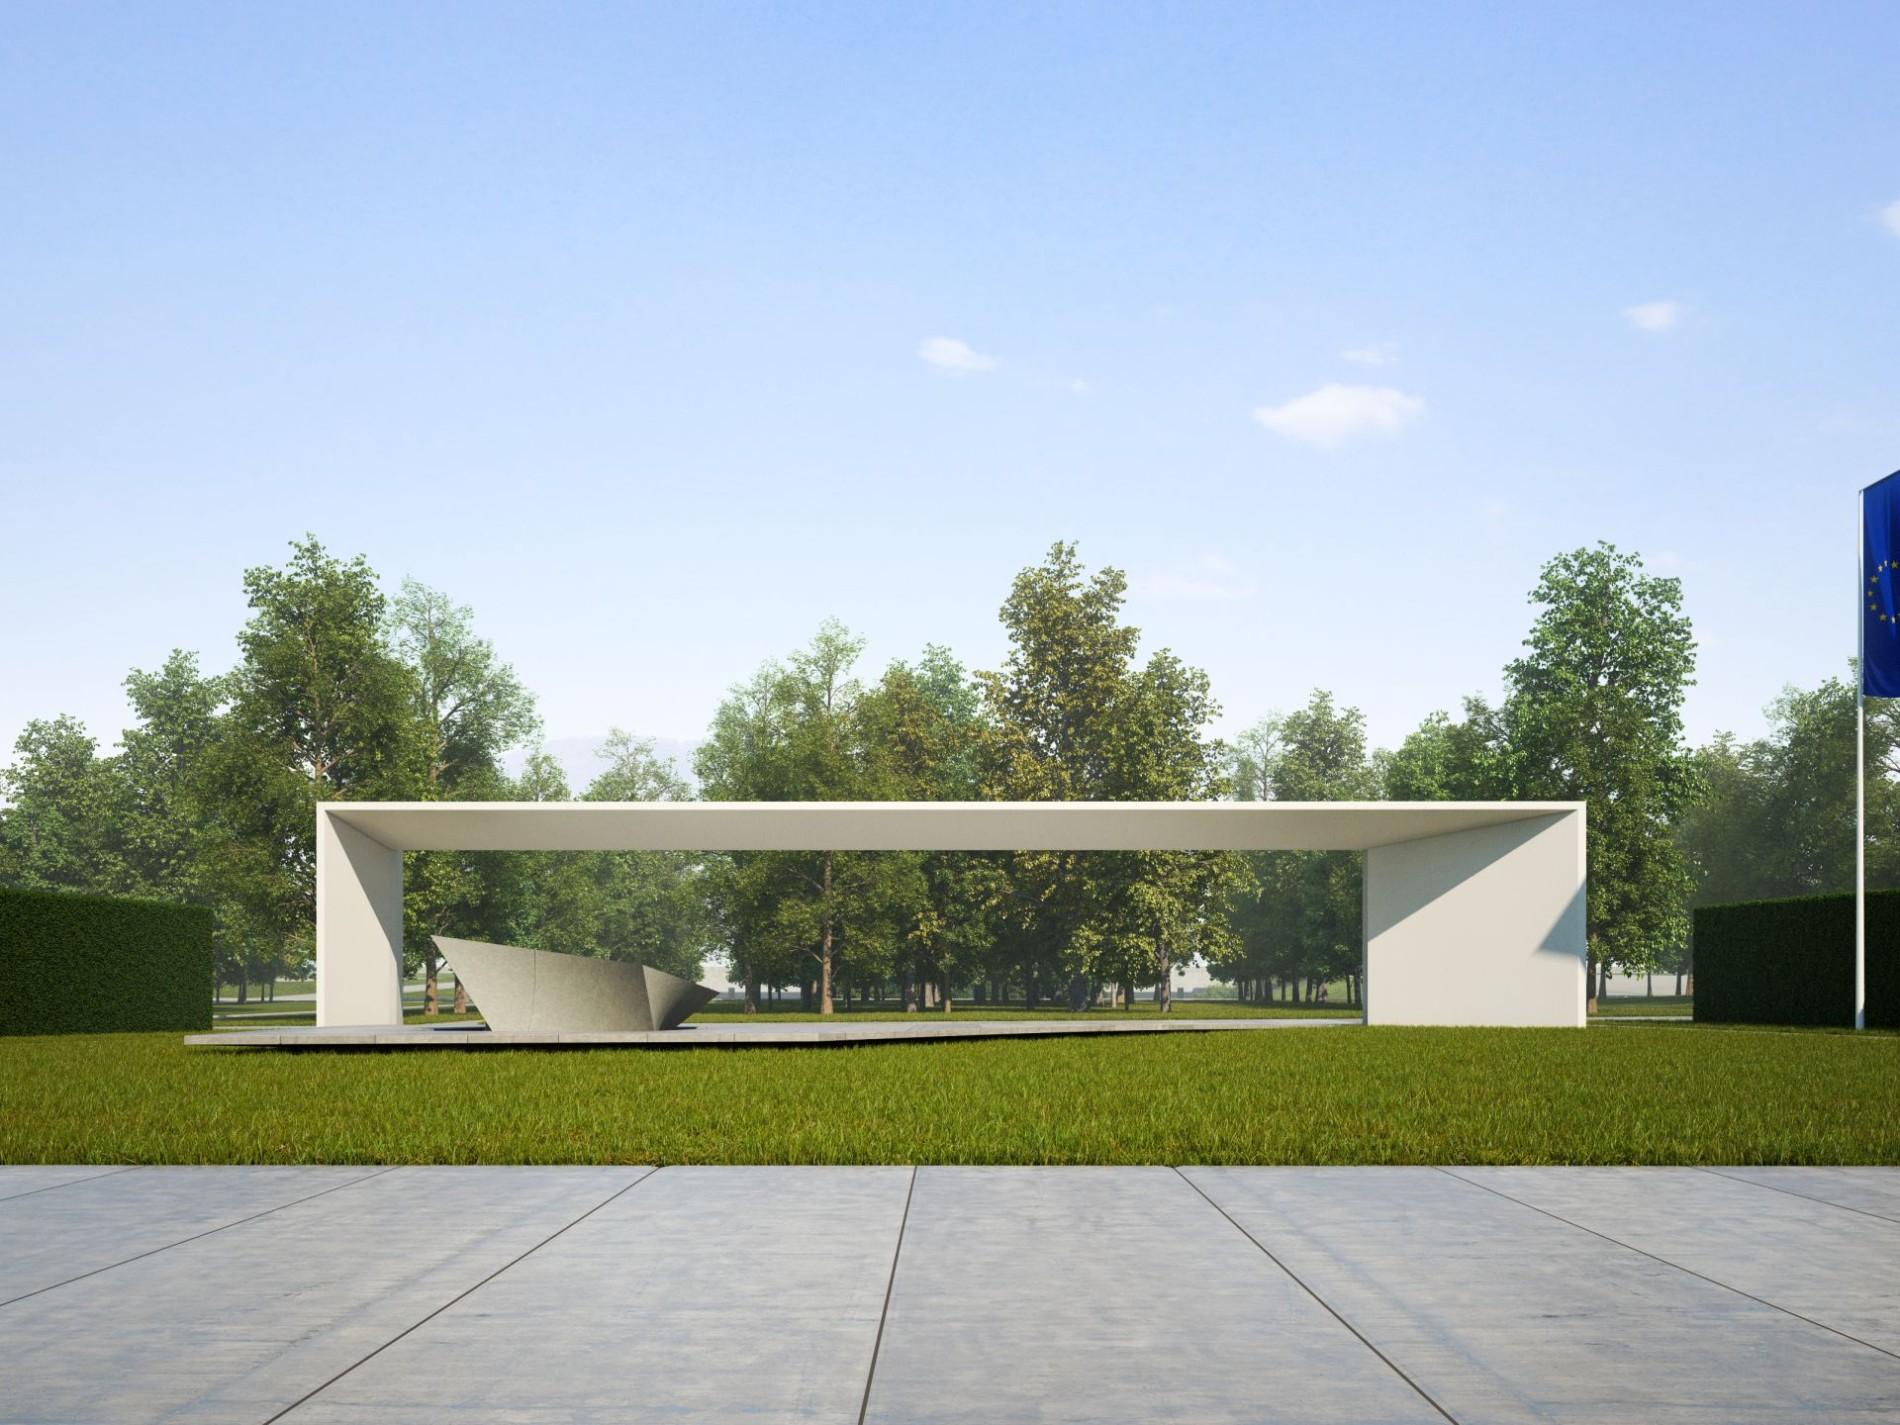 spomenik domovini, zagreb, hrvatska, croatia, upi-2m, arhitektura, fabijanić, upi-2m, monument of the homeland